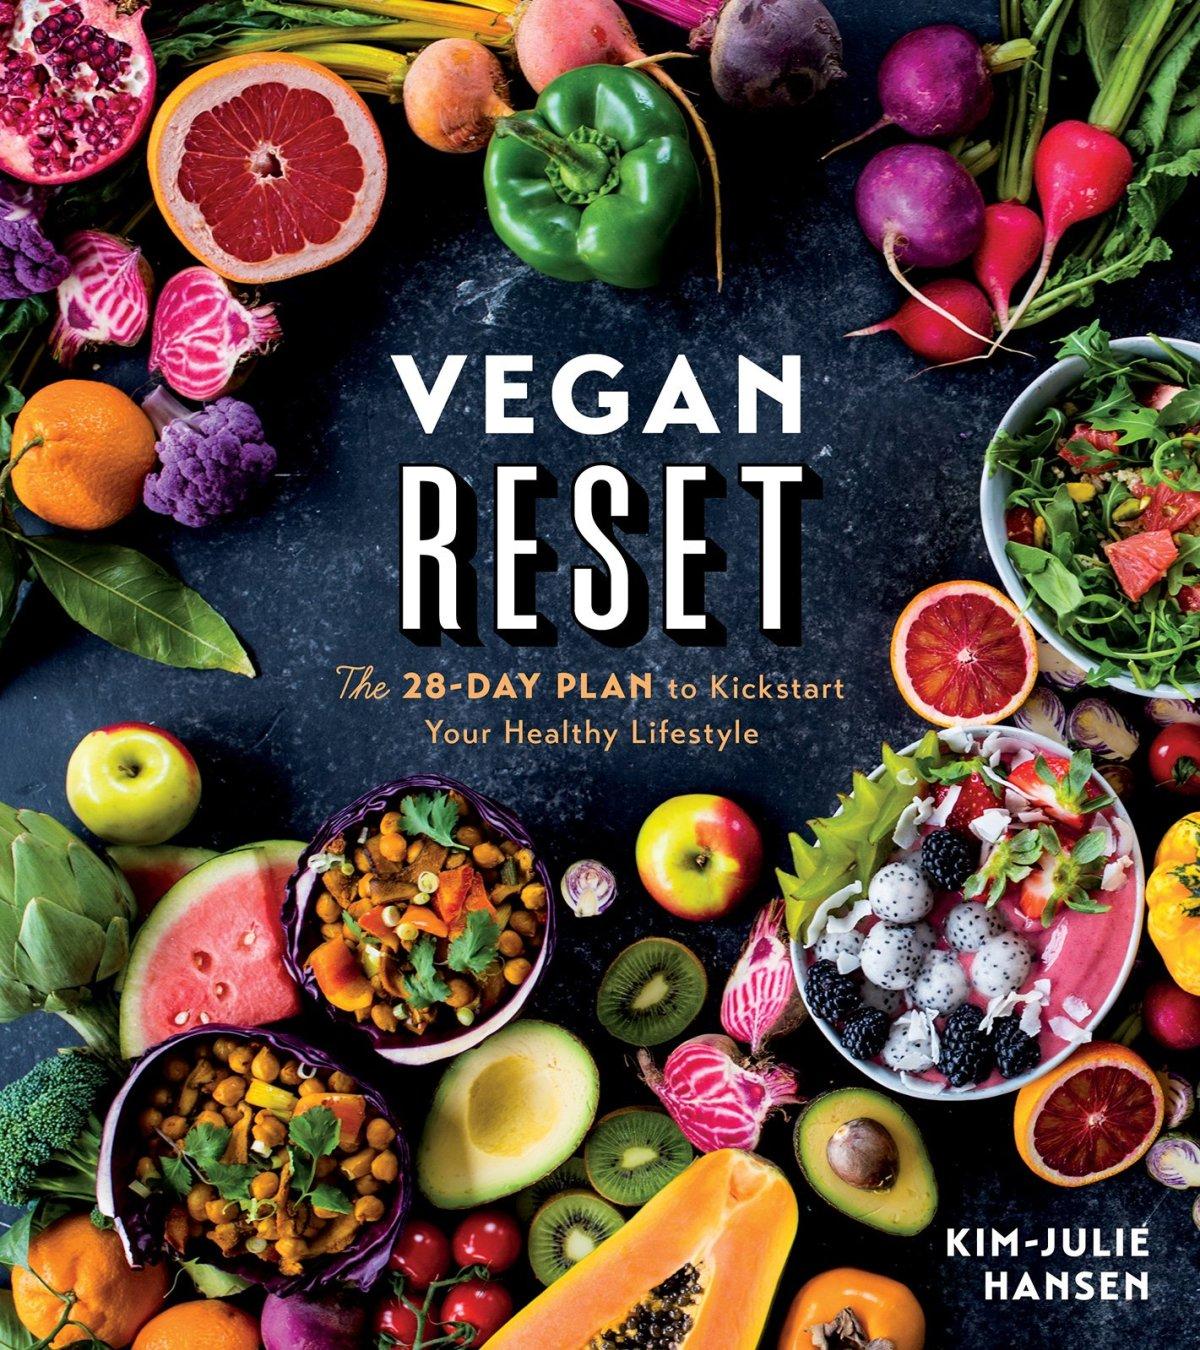 Vegan Reset: The 28-Day Plan to Kickstart Your Healthy Lifestyle 1